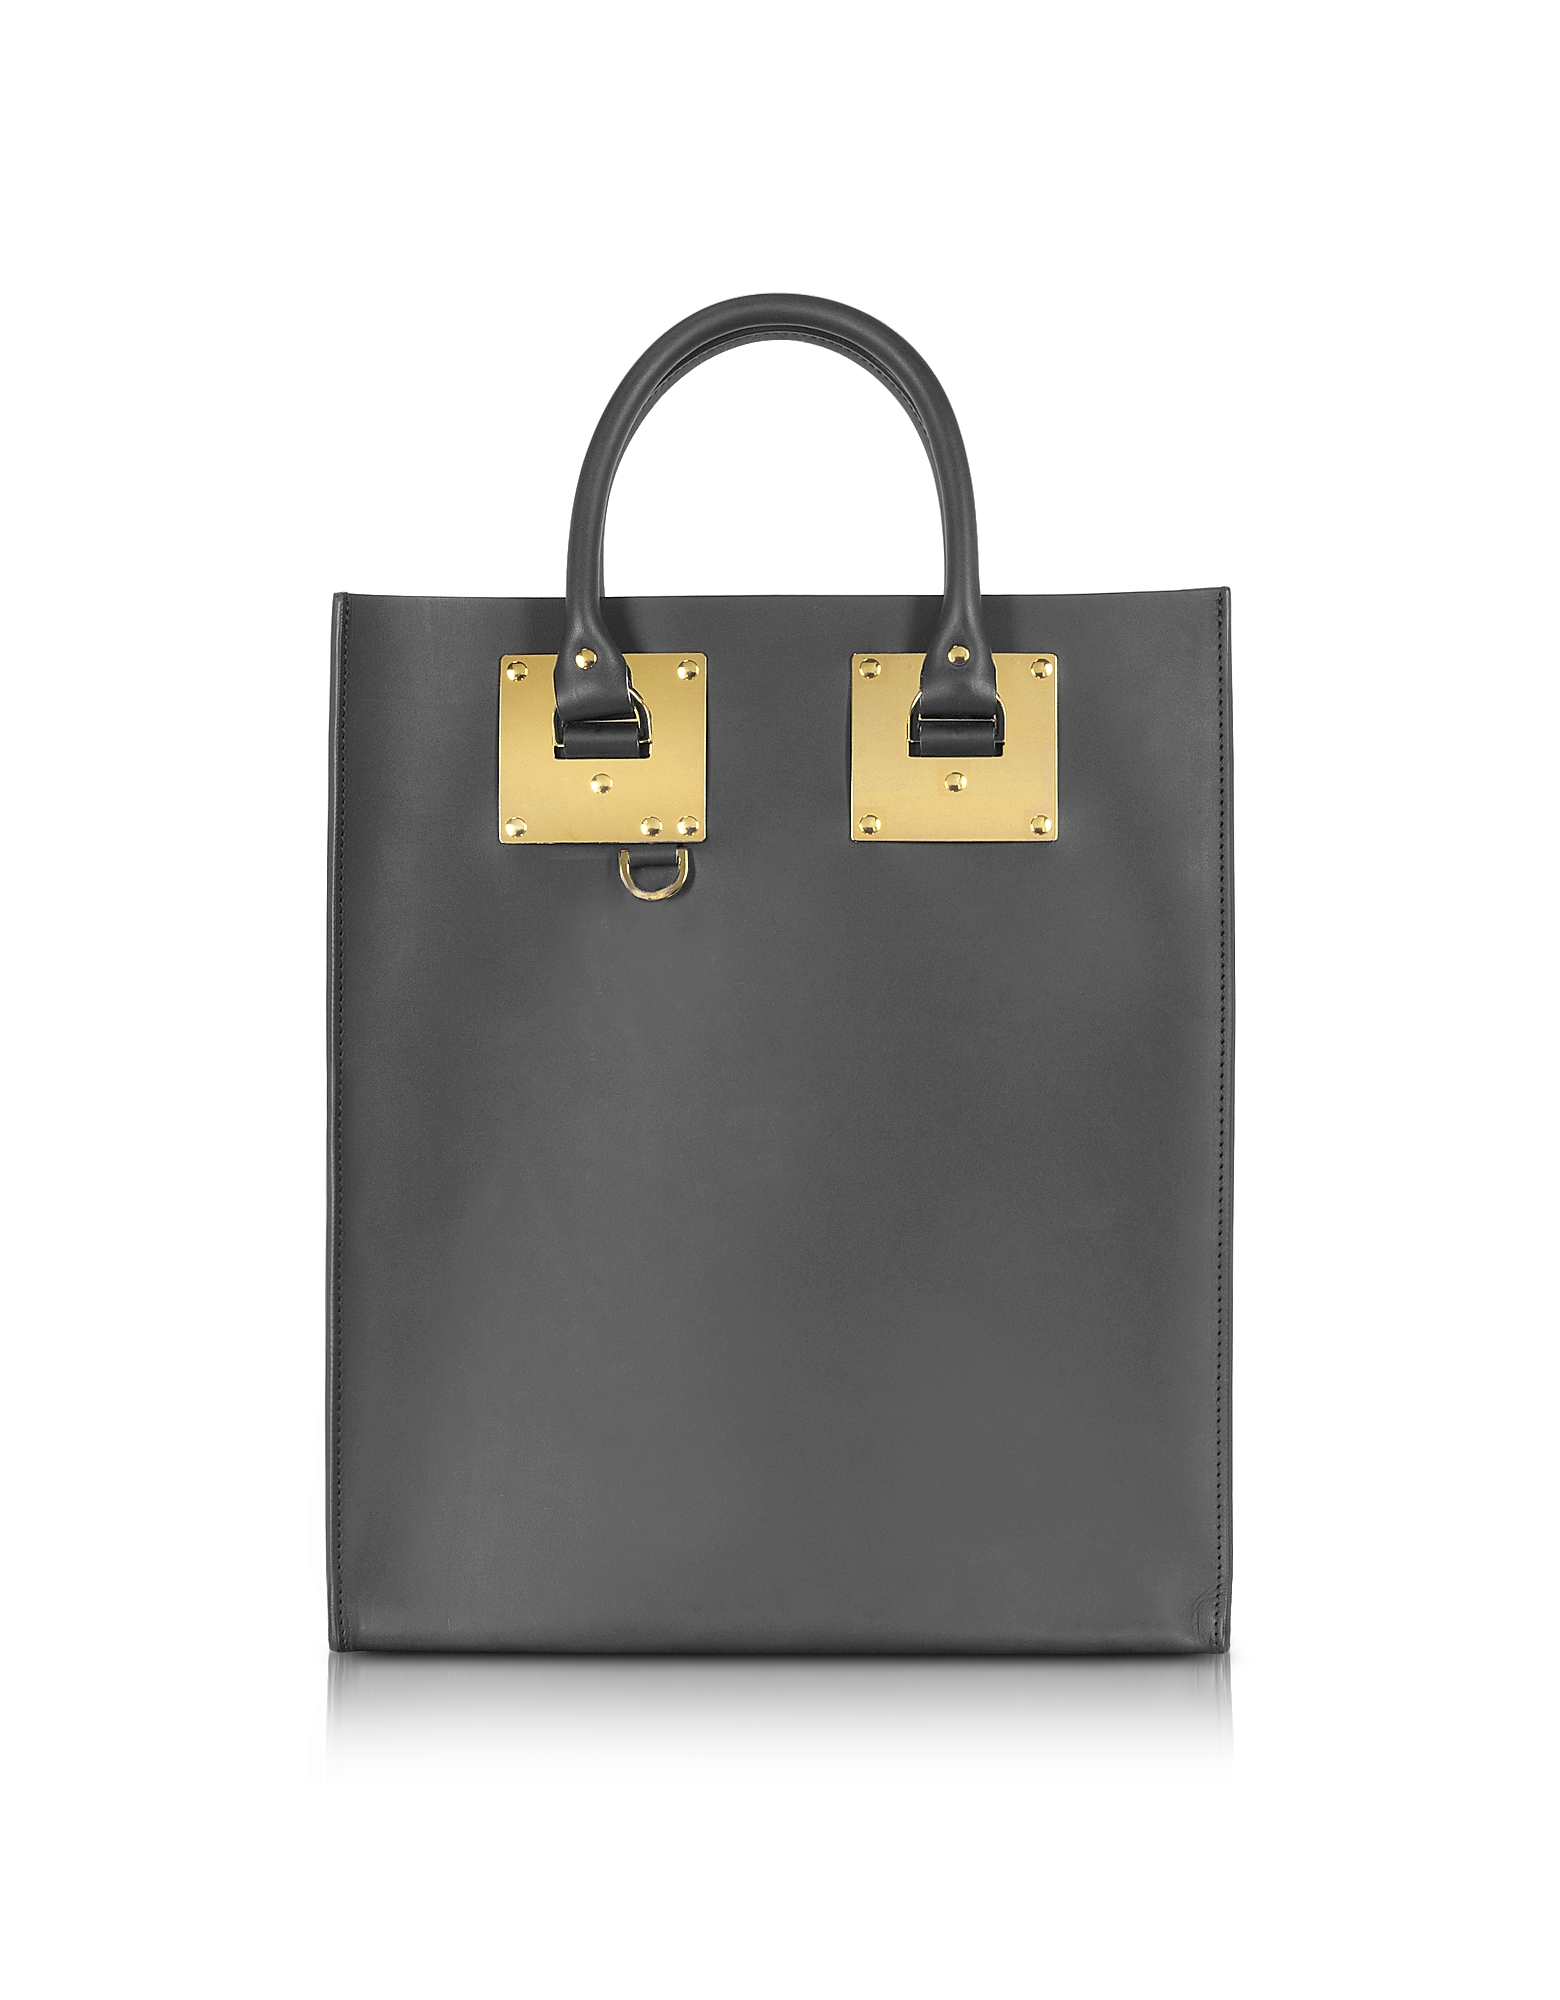 Sophie Hulme Handbags, Charcoal Albion Mini Tote Bag